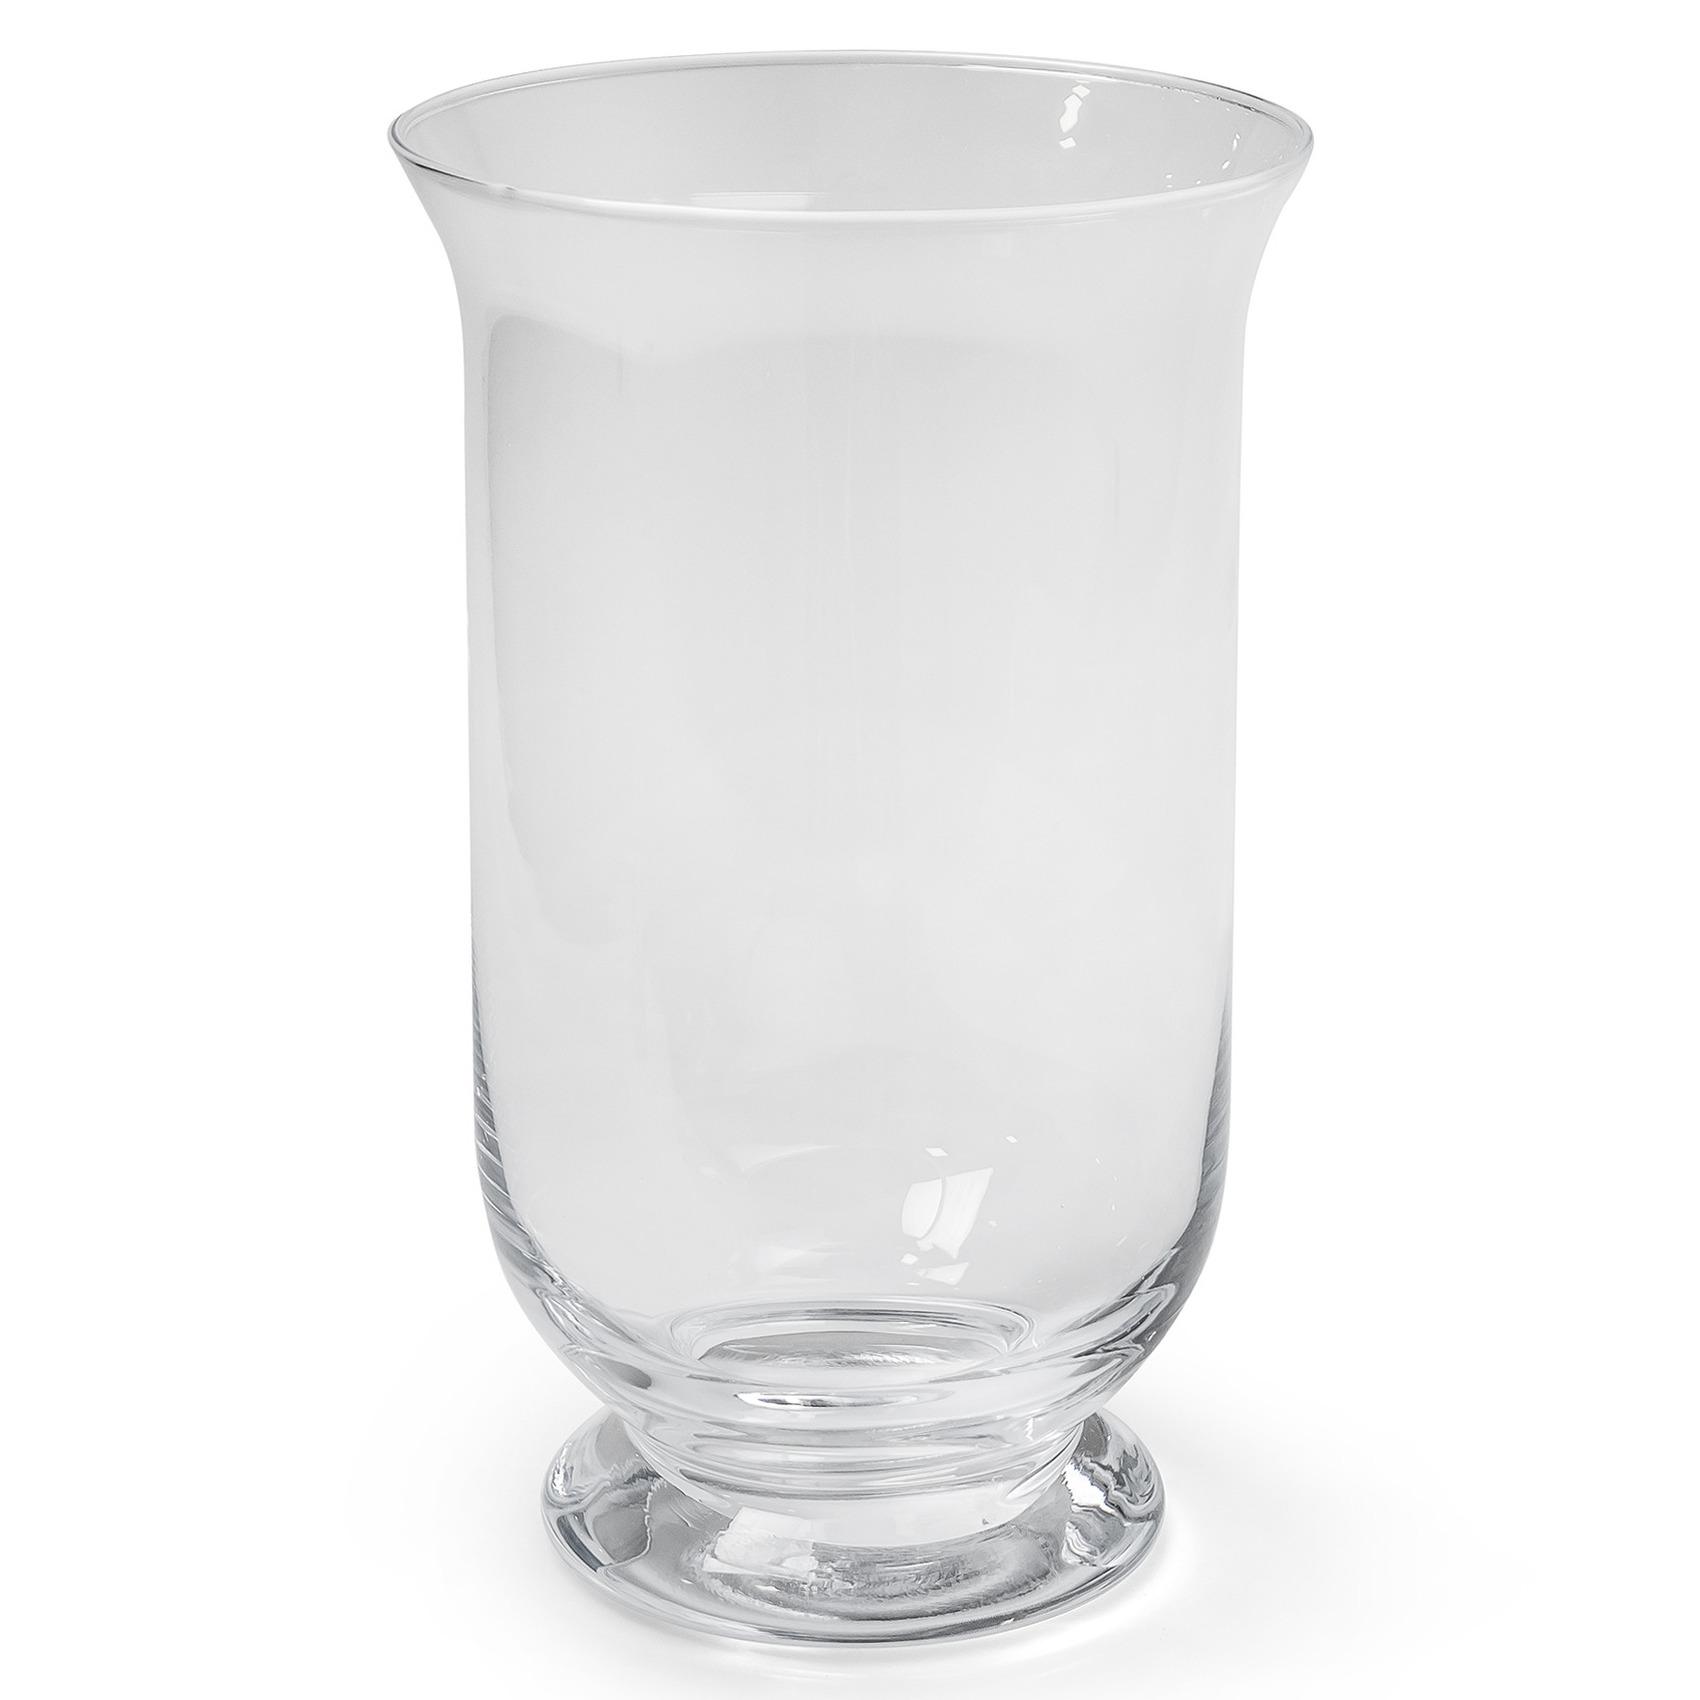 Transparante windlicht kaarsenhouder van glas 15 x 25 cm